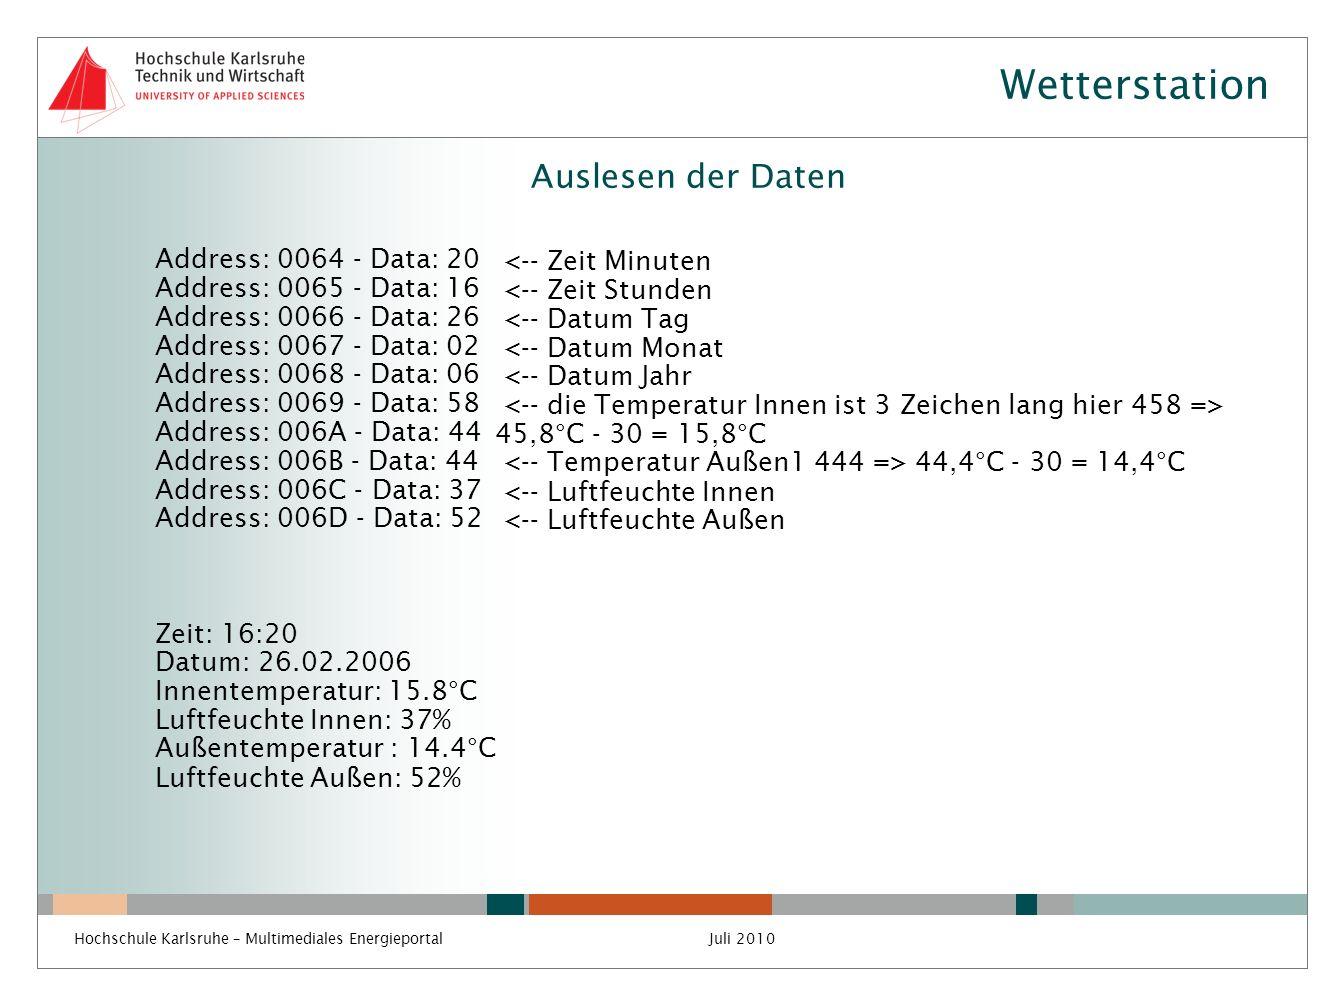 Wetterstation Hochschule Karlsruhe – Multimediales EnergieportalJuli 2010 Auslesen der Daten Address: 0064 - Data: 20 Address: 0065 - Data: 16 Address